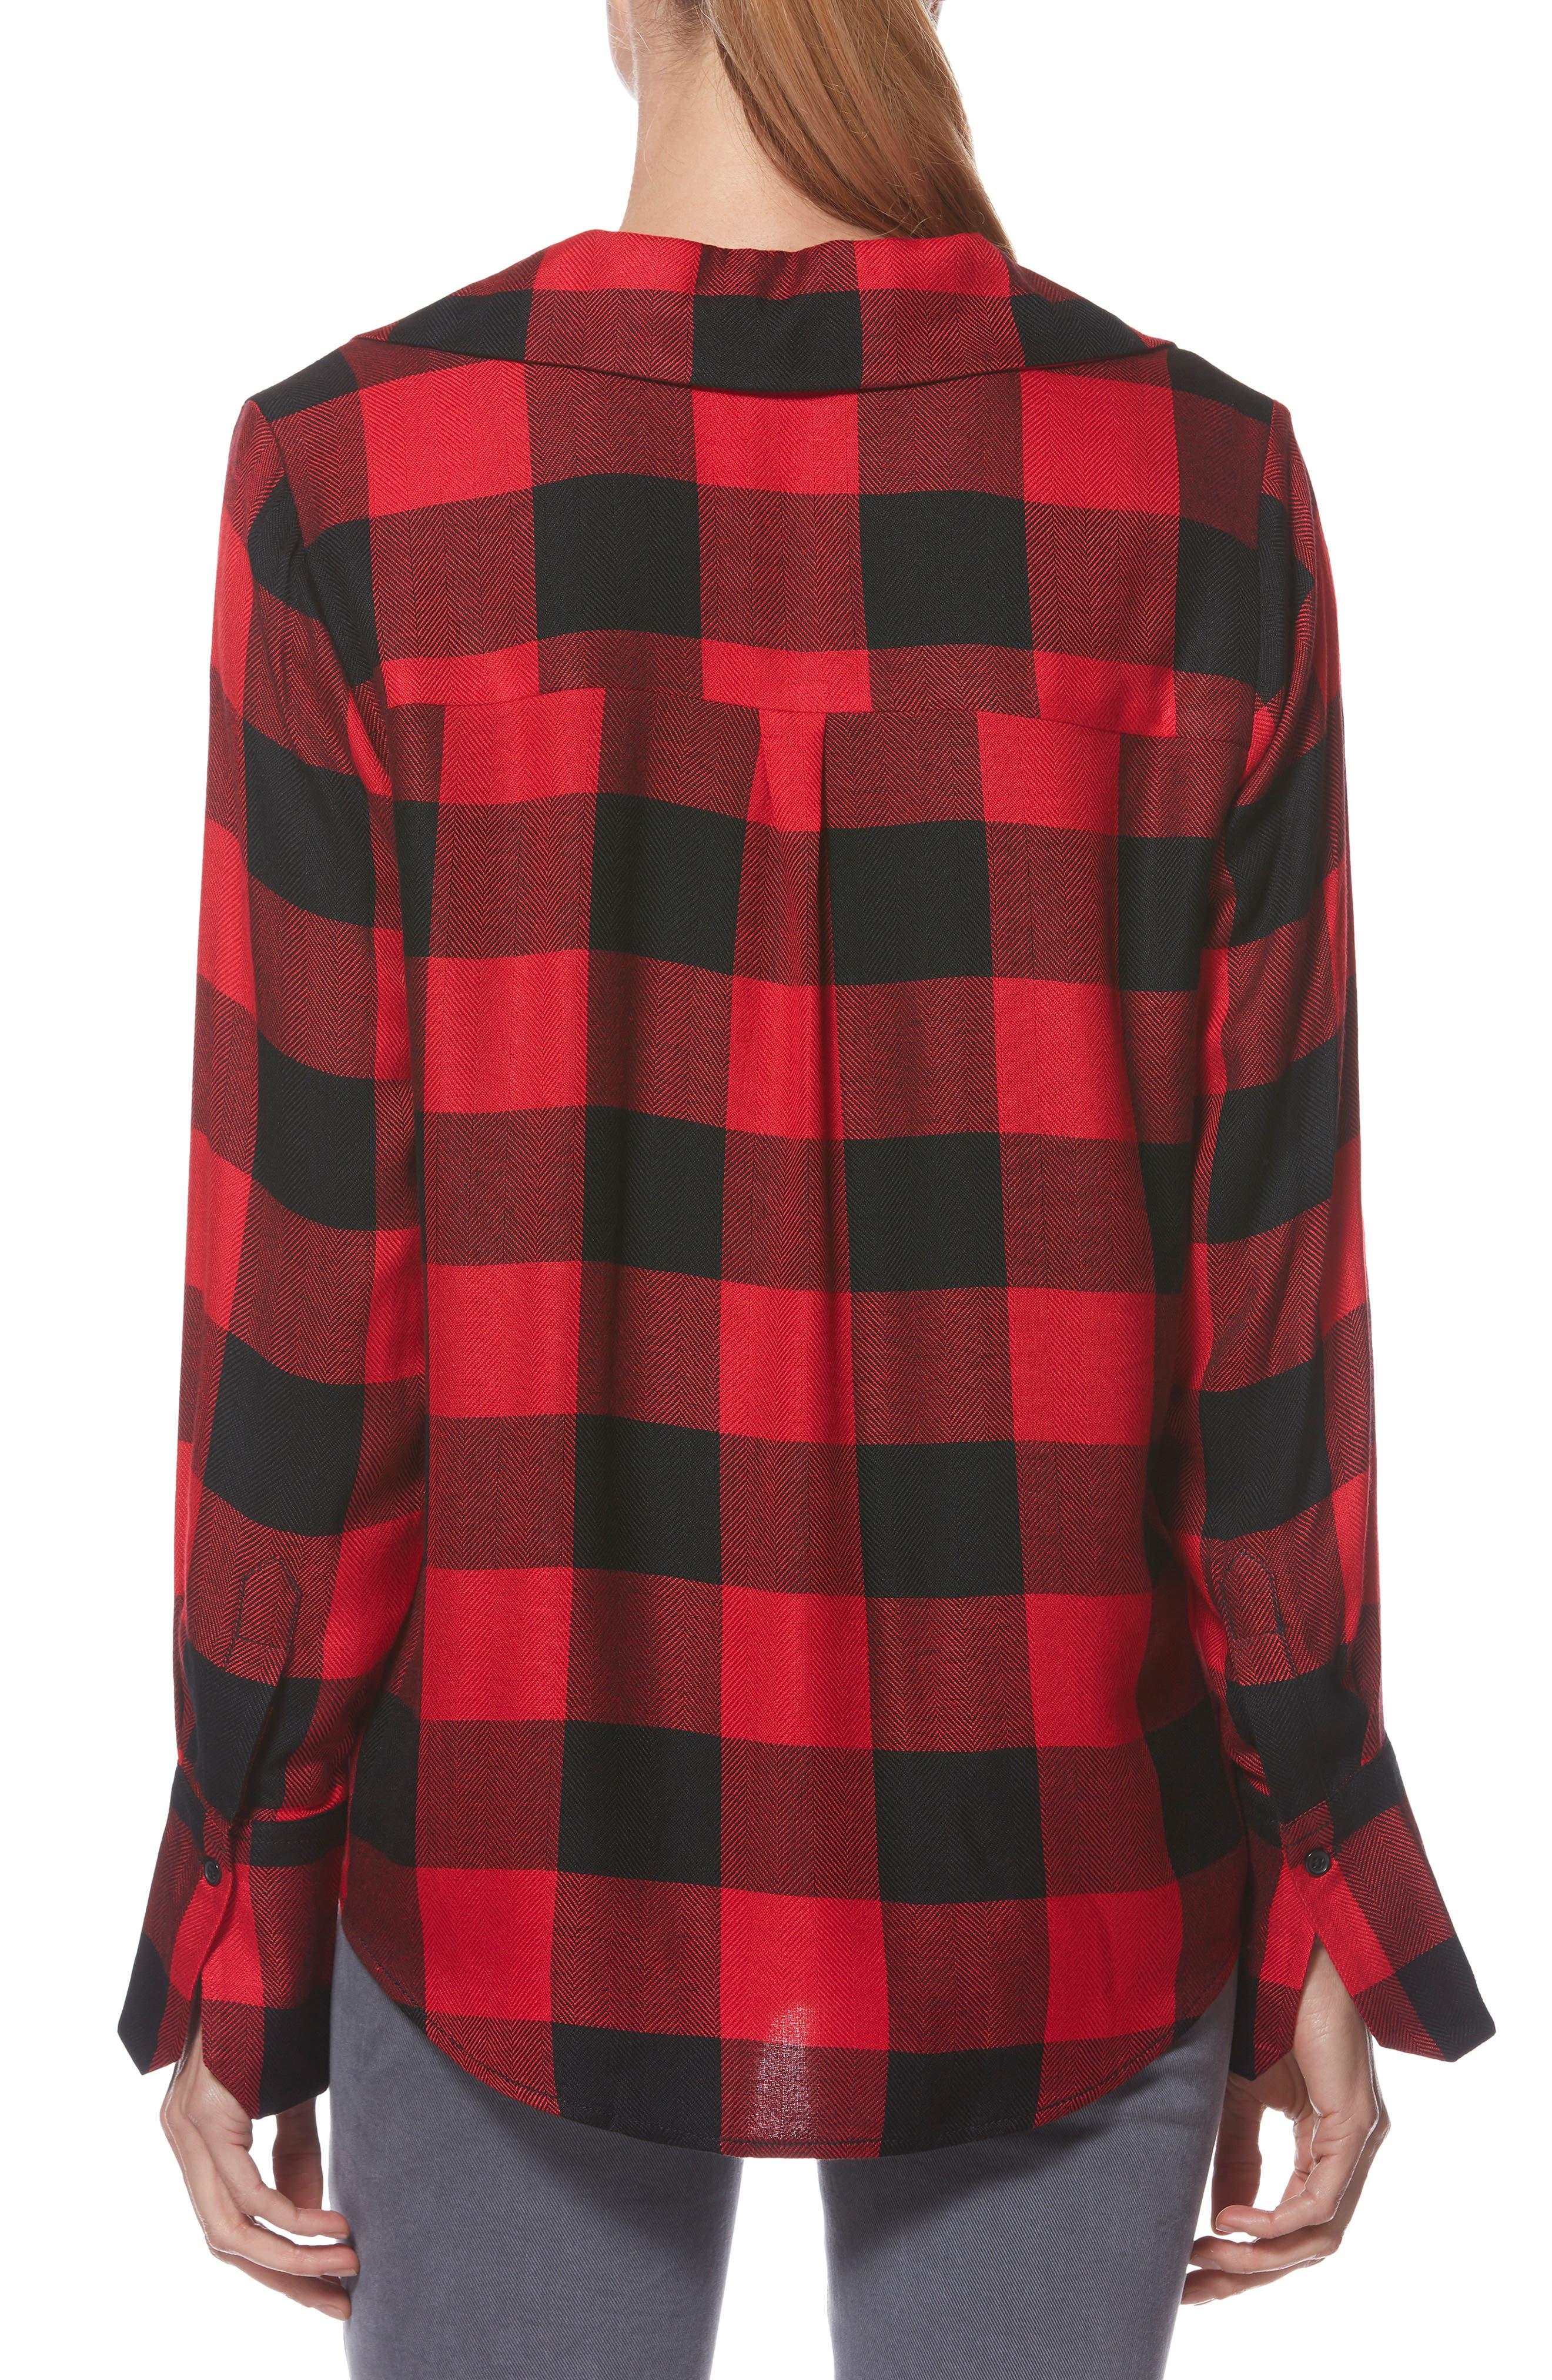 PAIGE,                             Elora Shirt,                             Alternate thumbnail 2, color,                             TRUE RED / BLACK